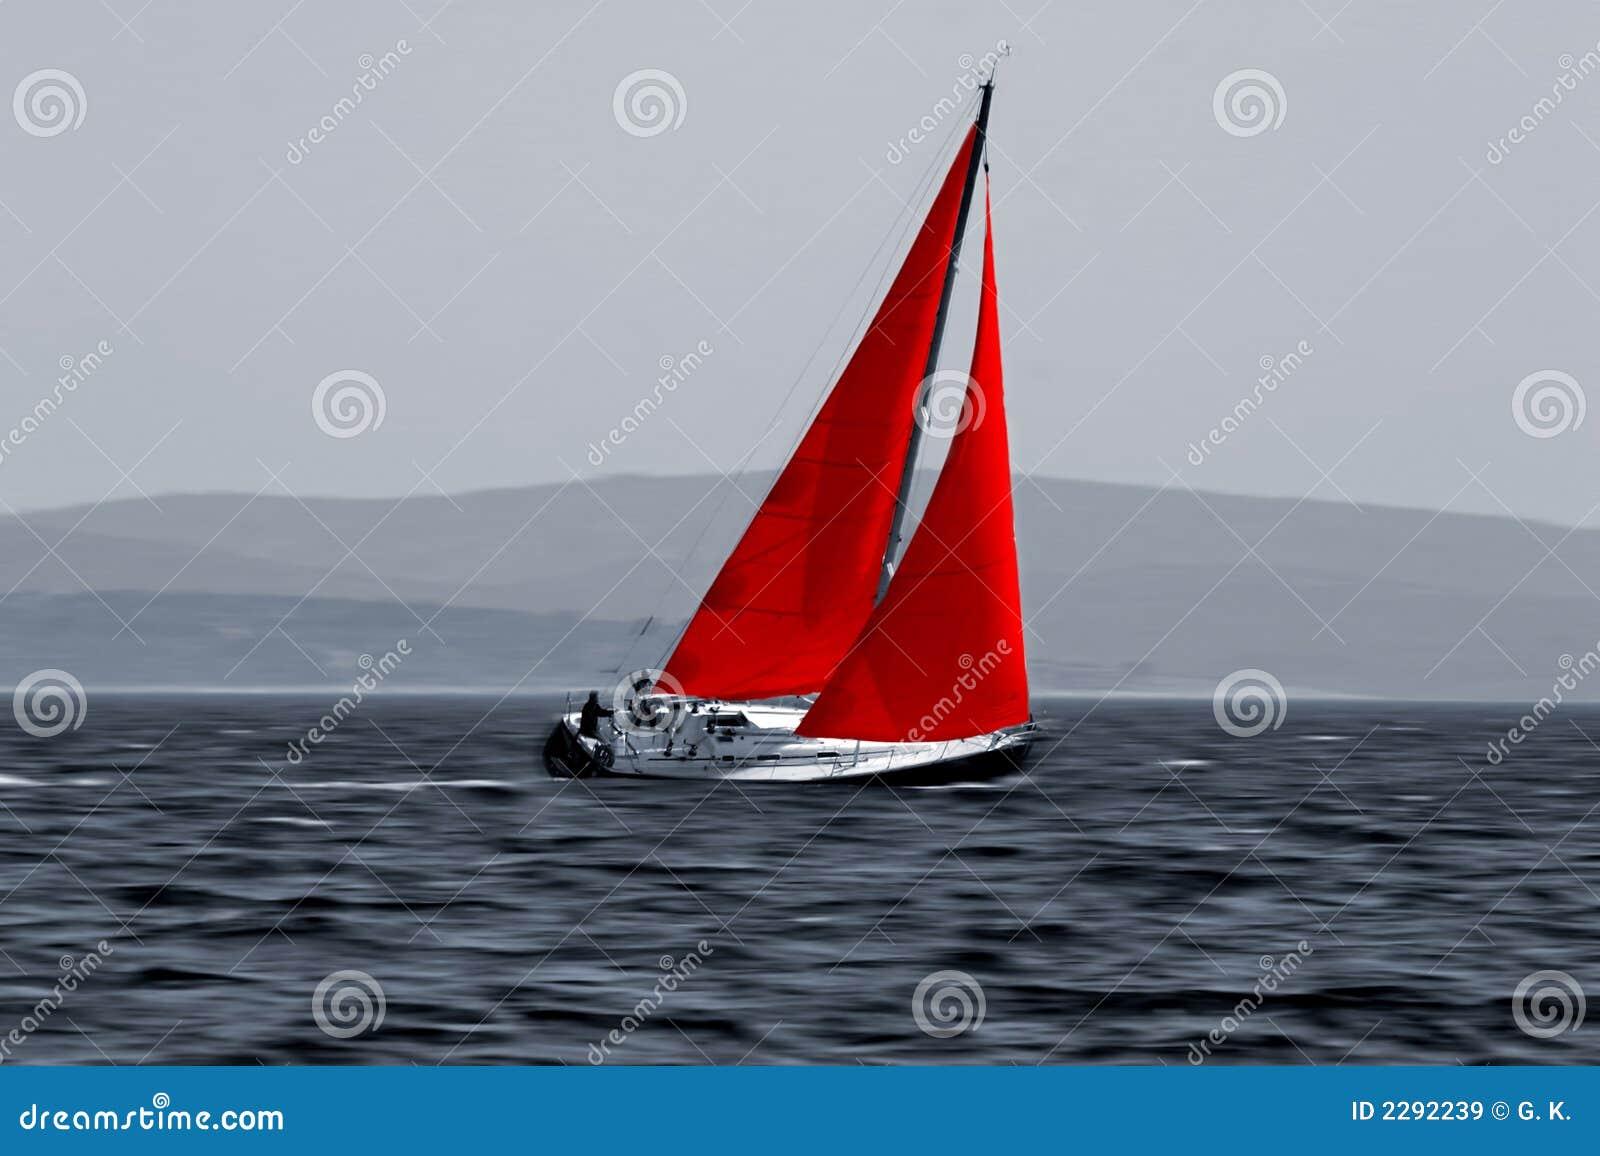 Barco de vela que se mueve rápidamente